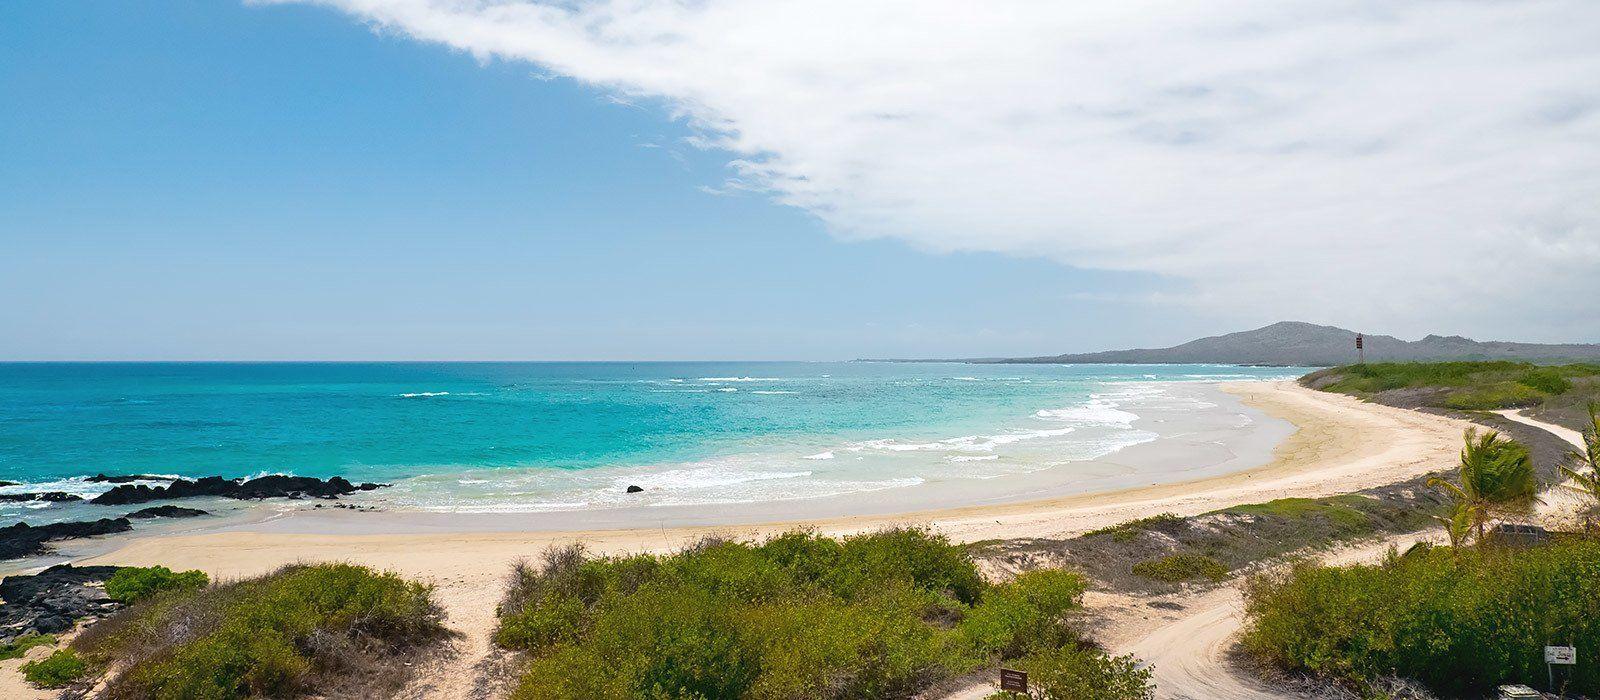 Galapagos: Nature's Secrets Revealed Tour Trip 2